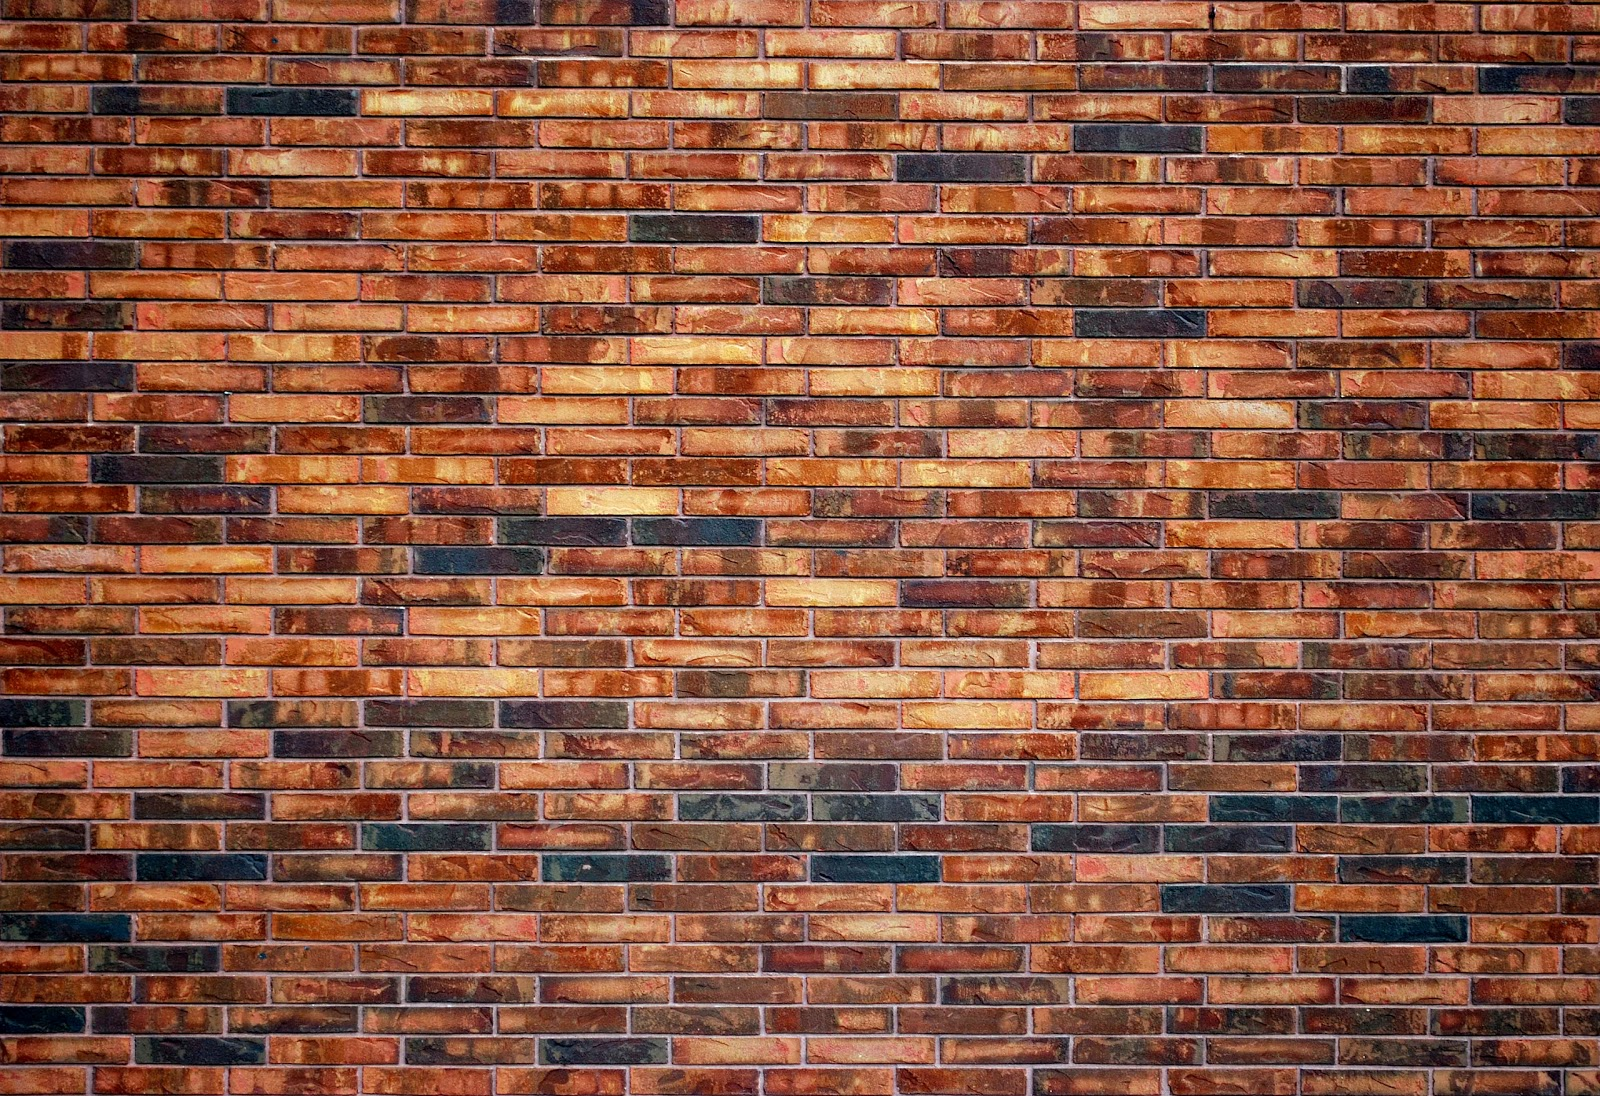 Brick Vector Picture: Brick Texture Wallpaper